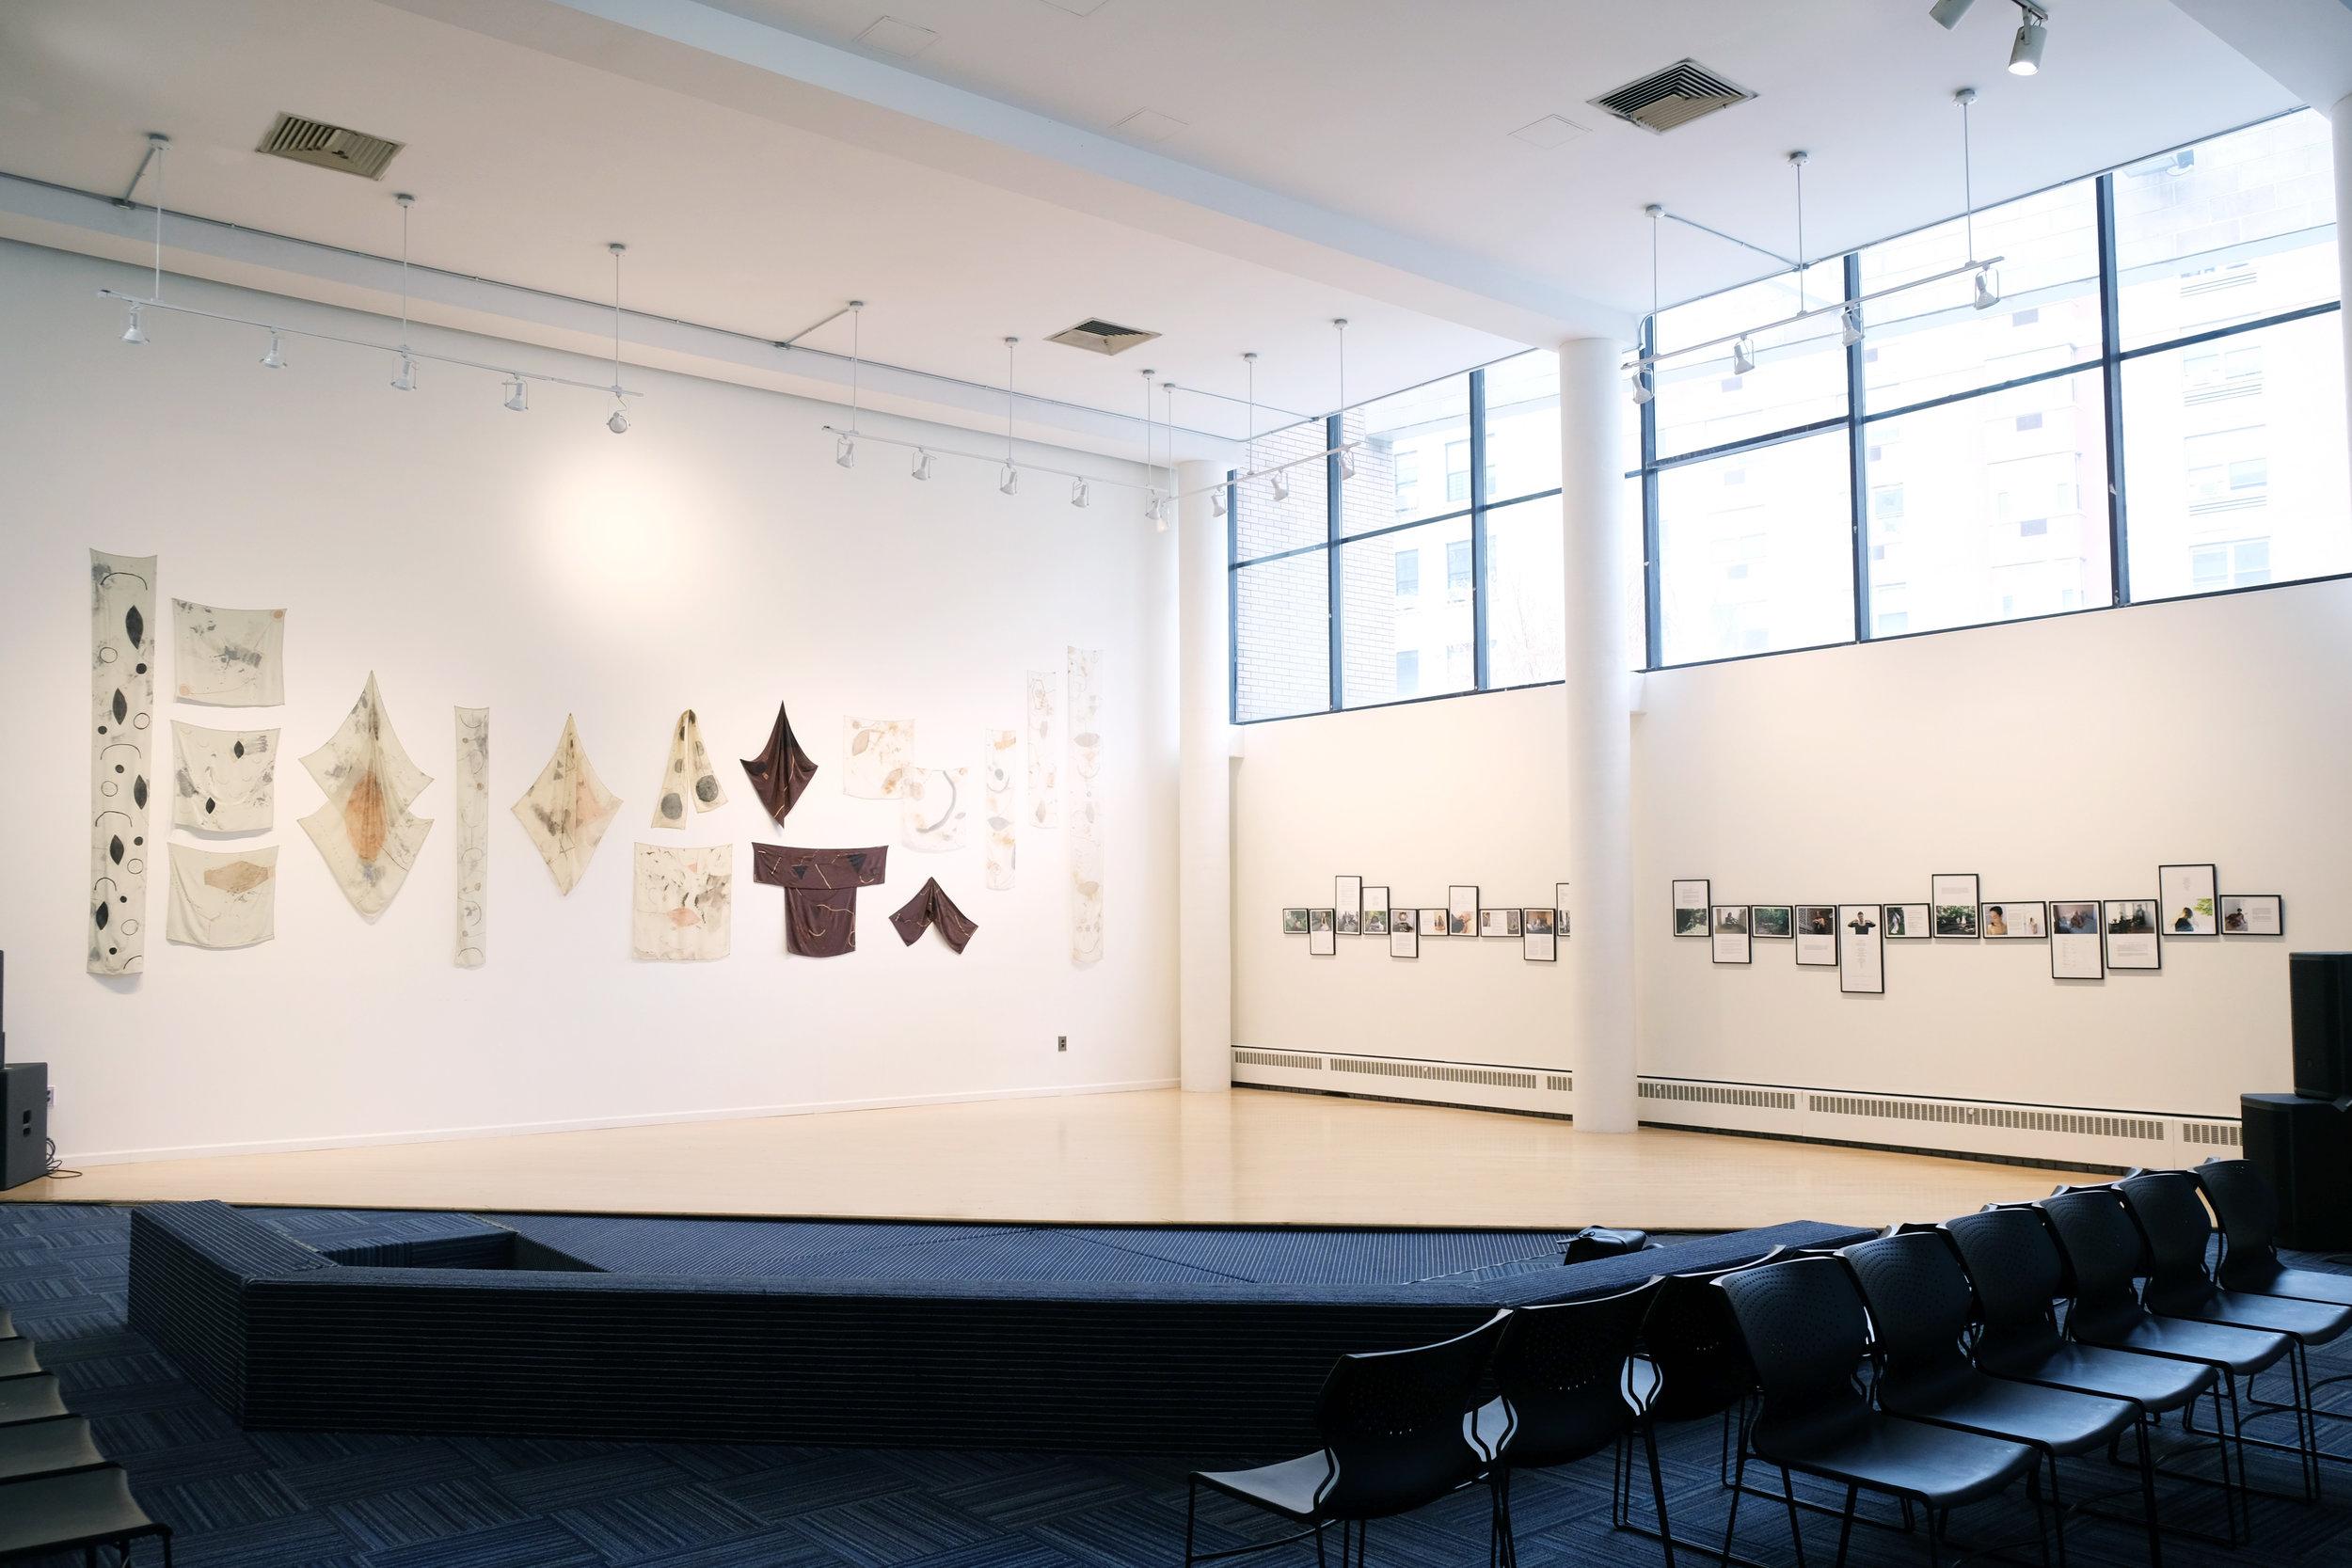 tarah douglas, studies of jahyne installation, 2017, Harlem School of the Arts, New York.